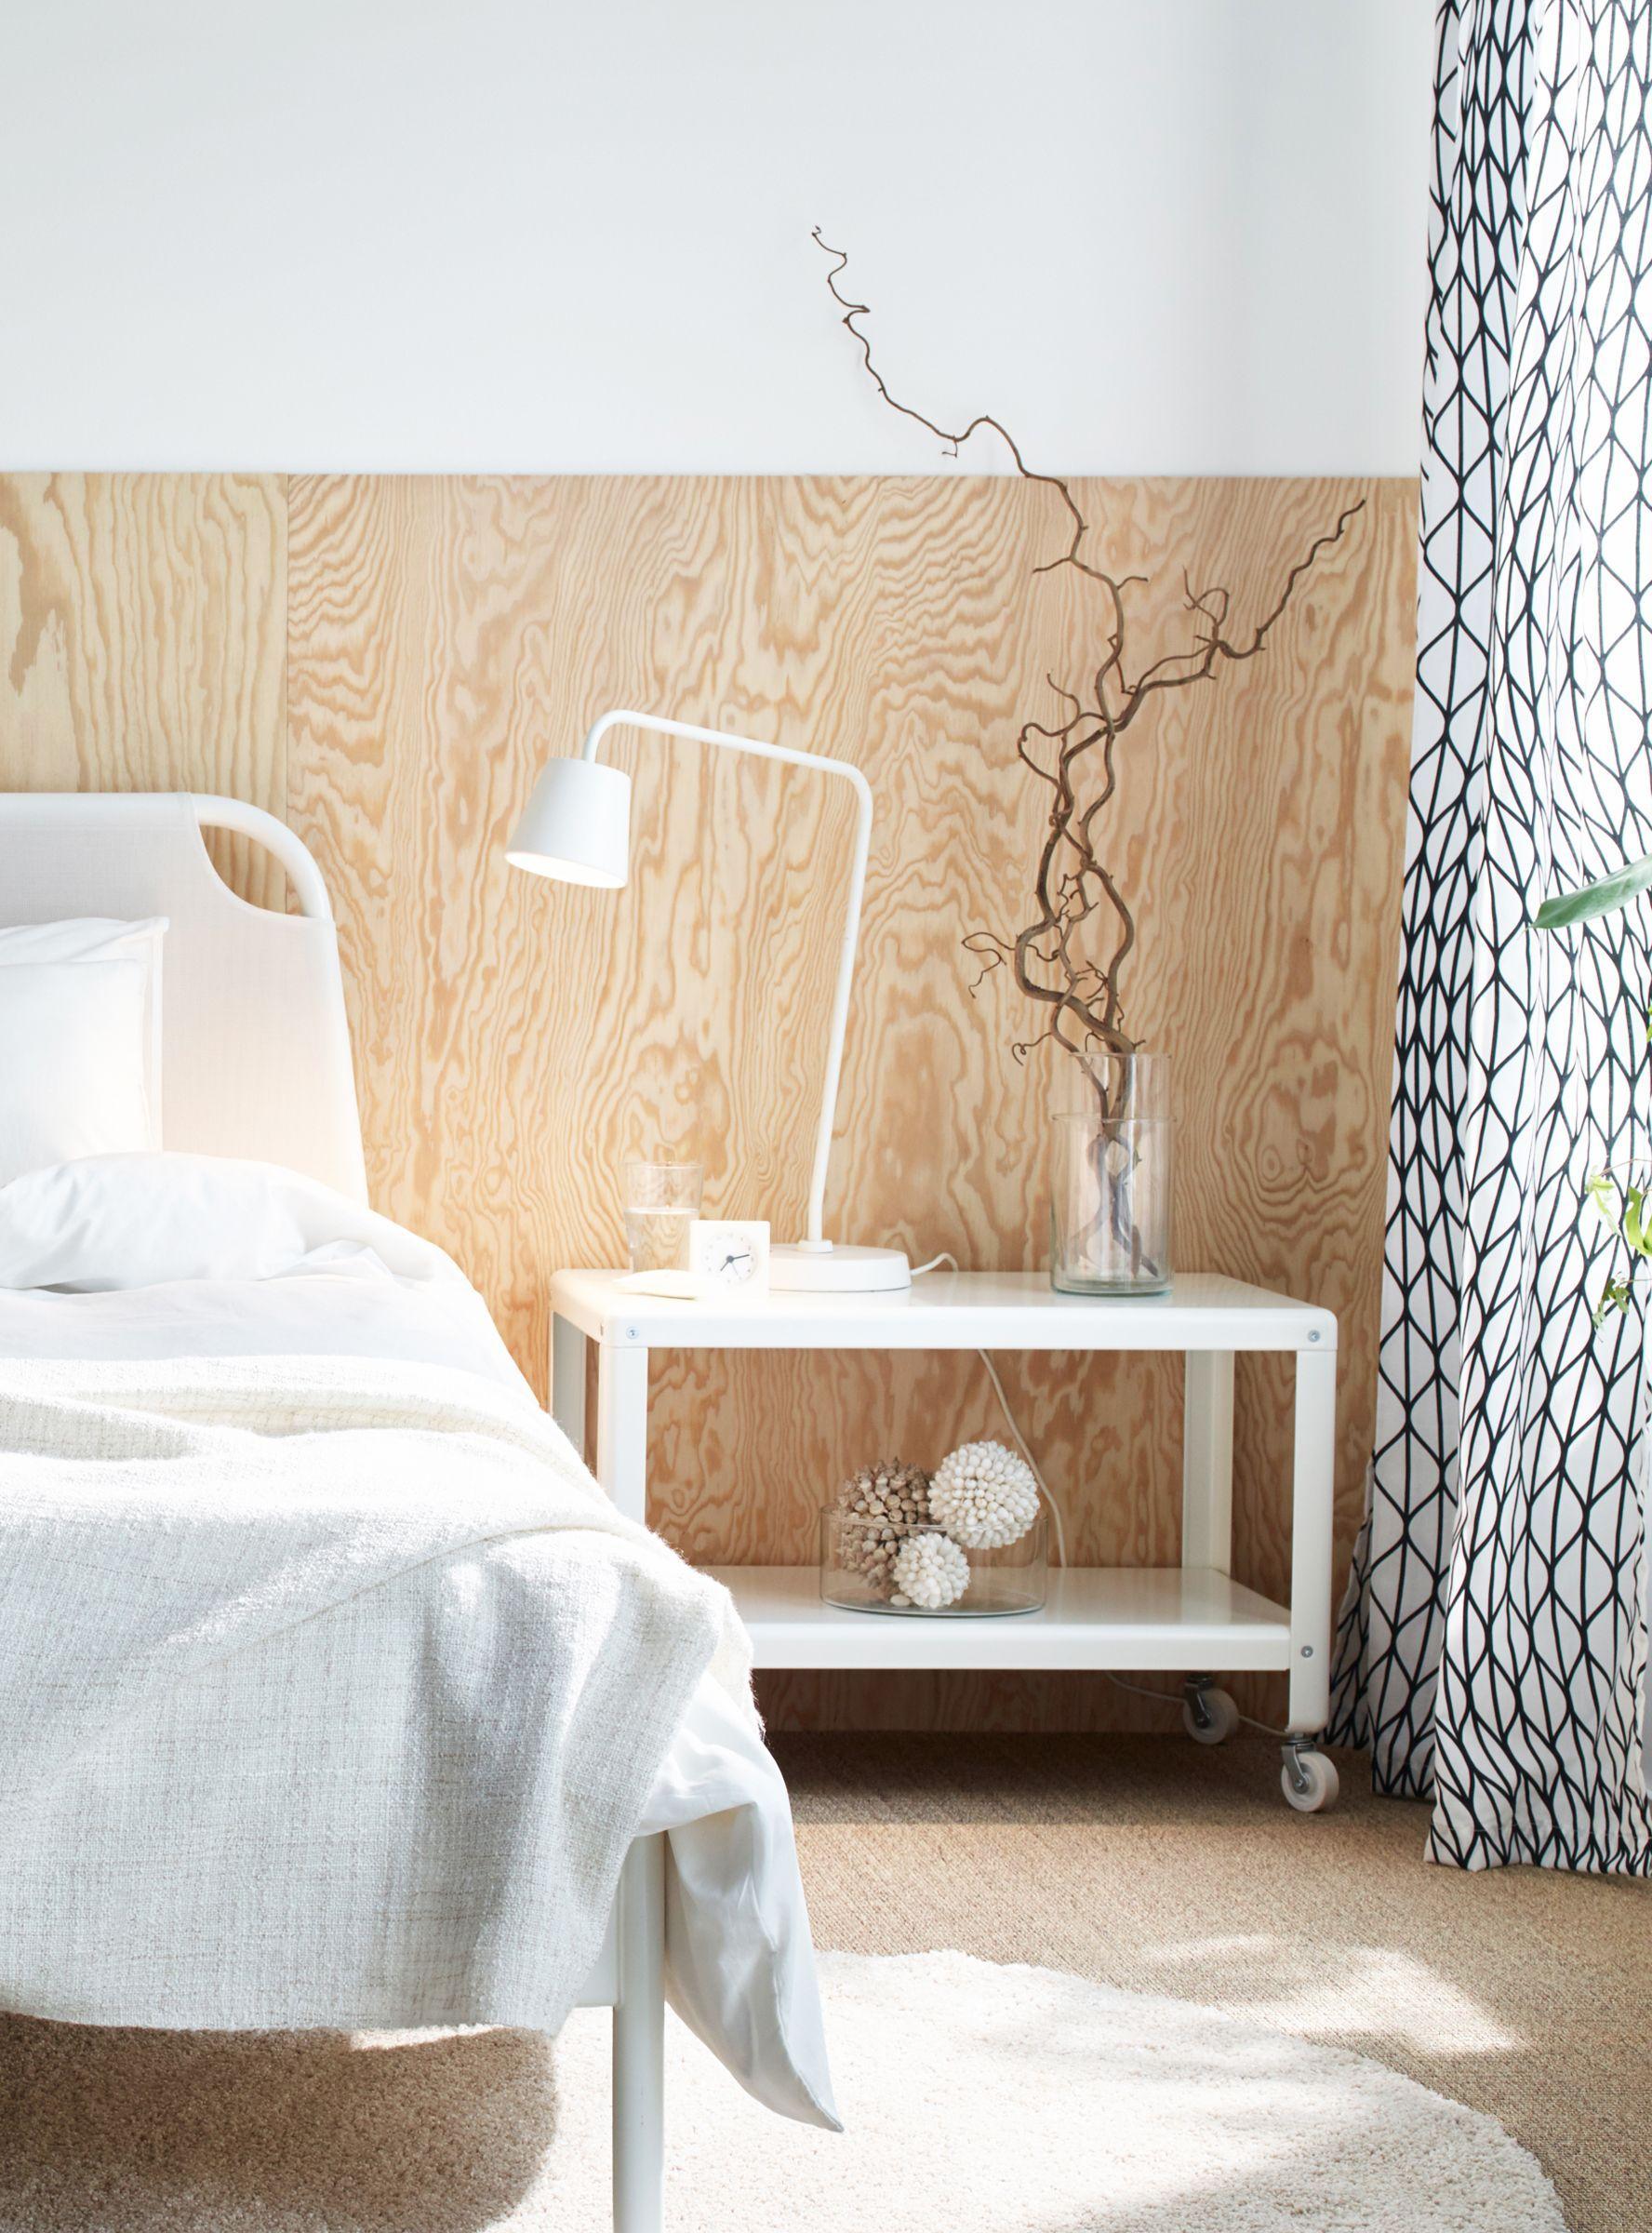 5 x 4 badezimmerdesigns stefanie zehetmeier stefaniezehetmeier on pinterest